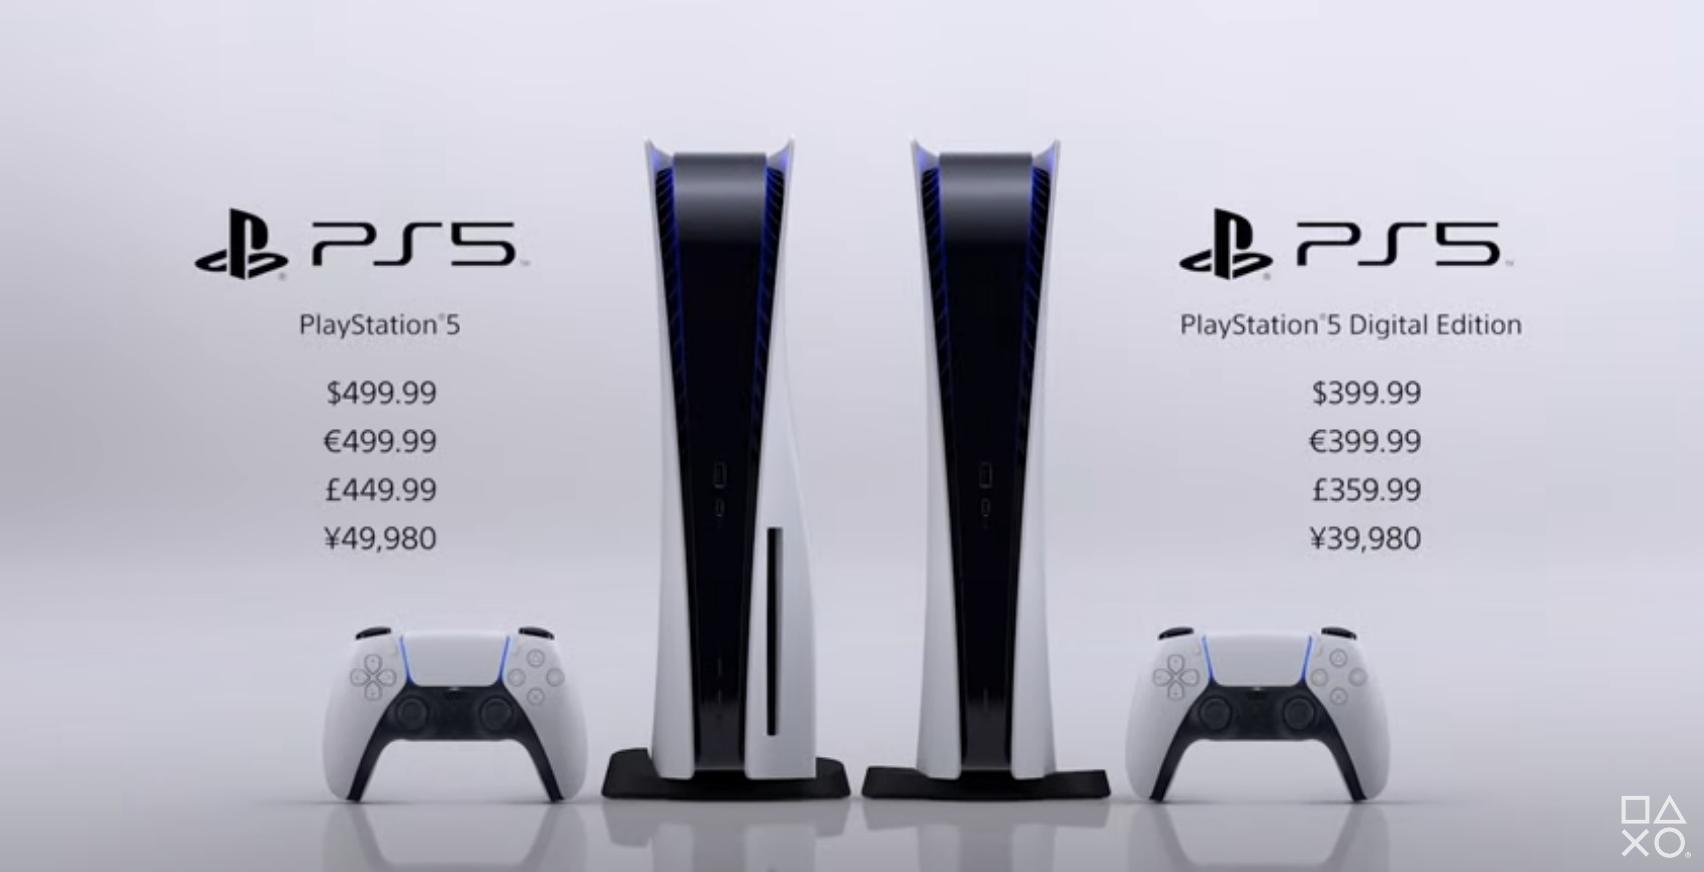 Prix PlayStation 5 et PS5 Digital Edition